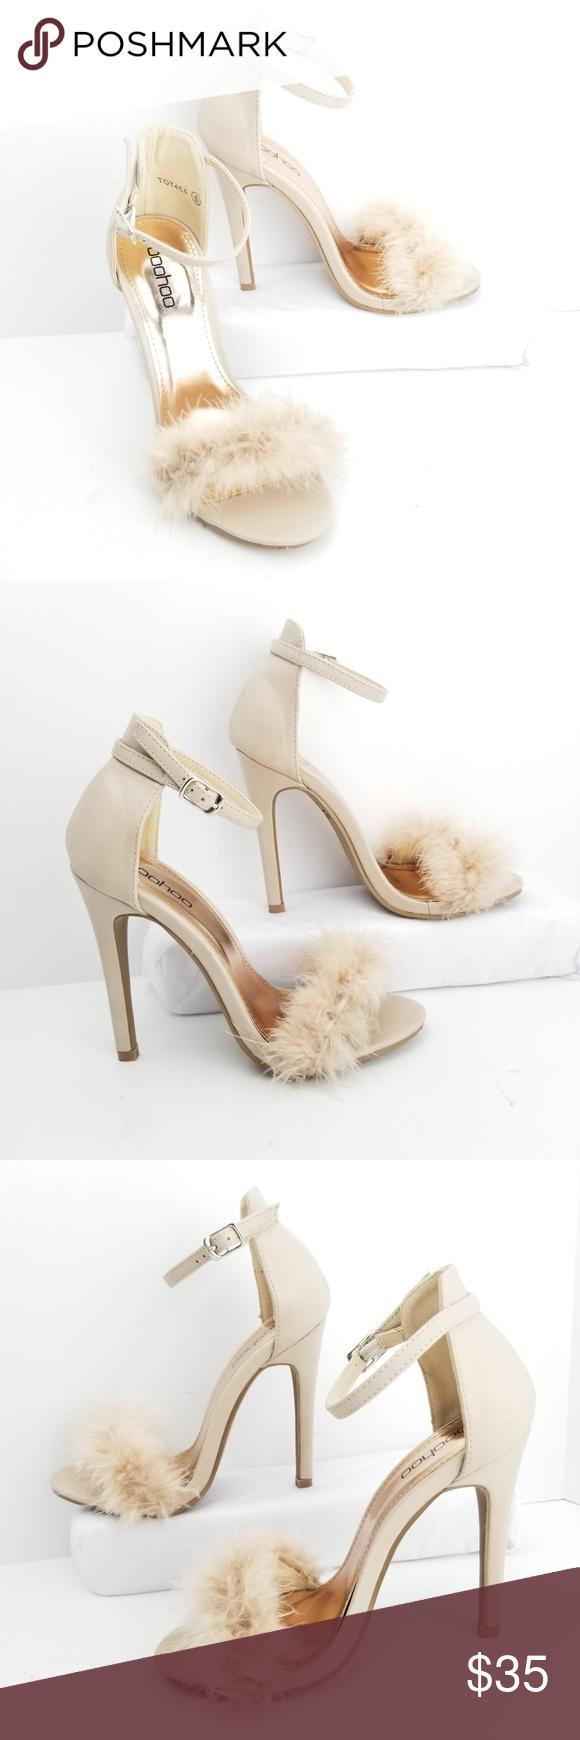 f88add49f0ee Boohoo Stilettos Size 5 Feather Ankle Strap Peep Heel 4.5